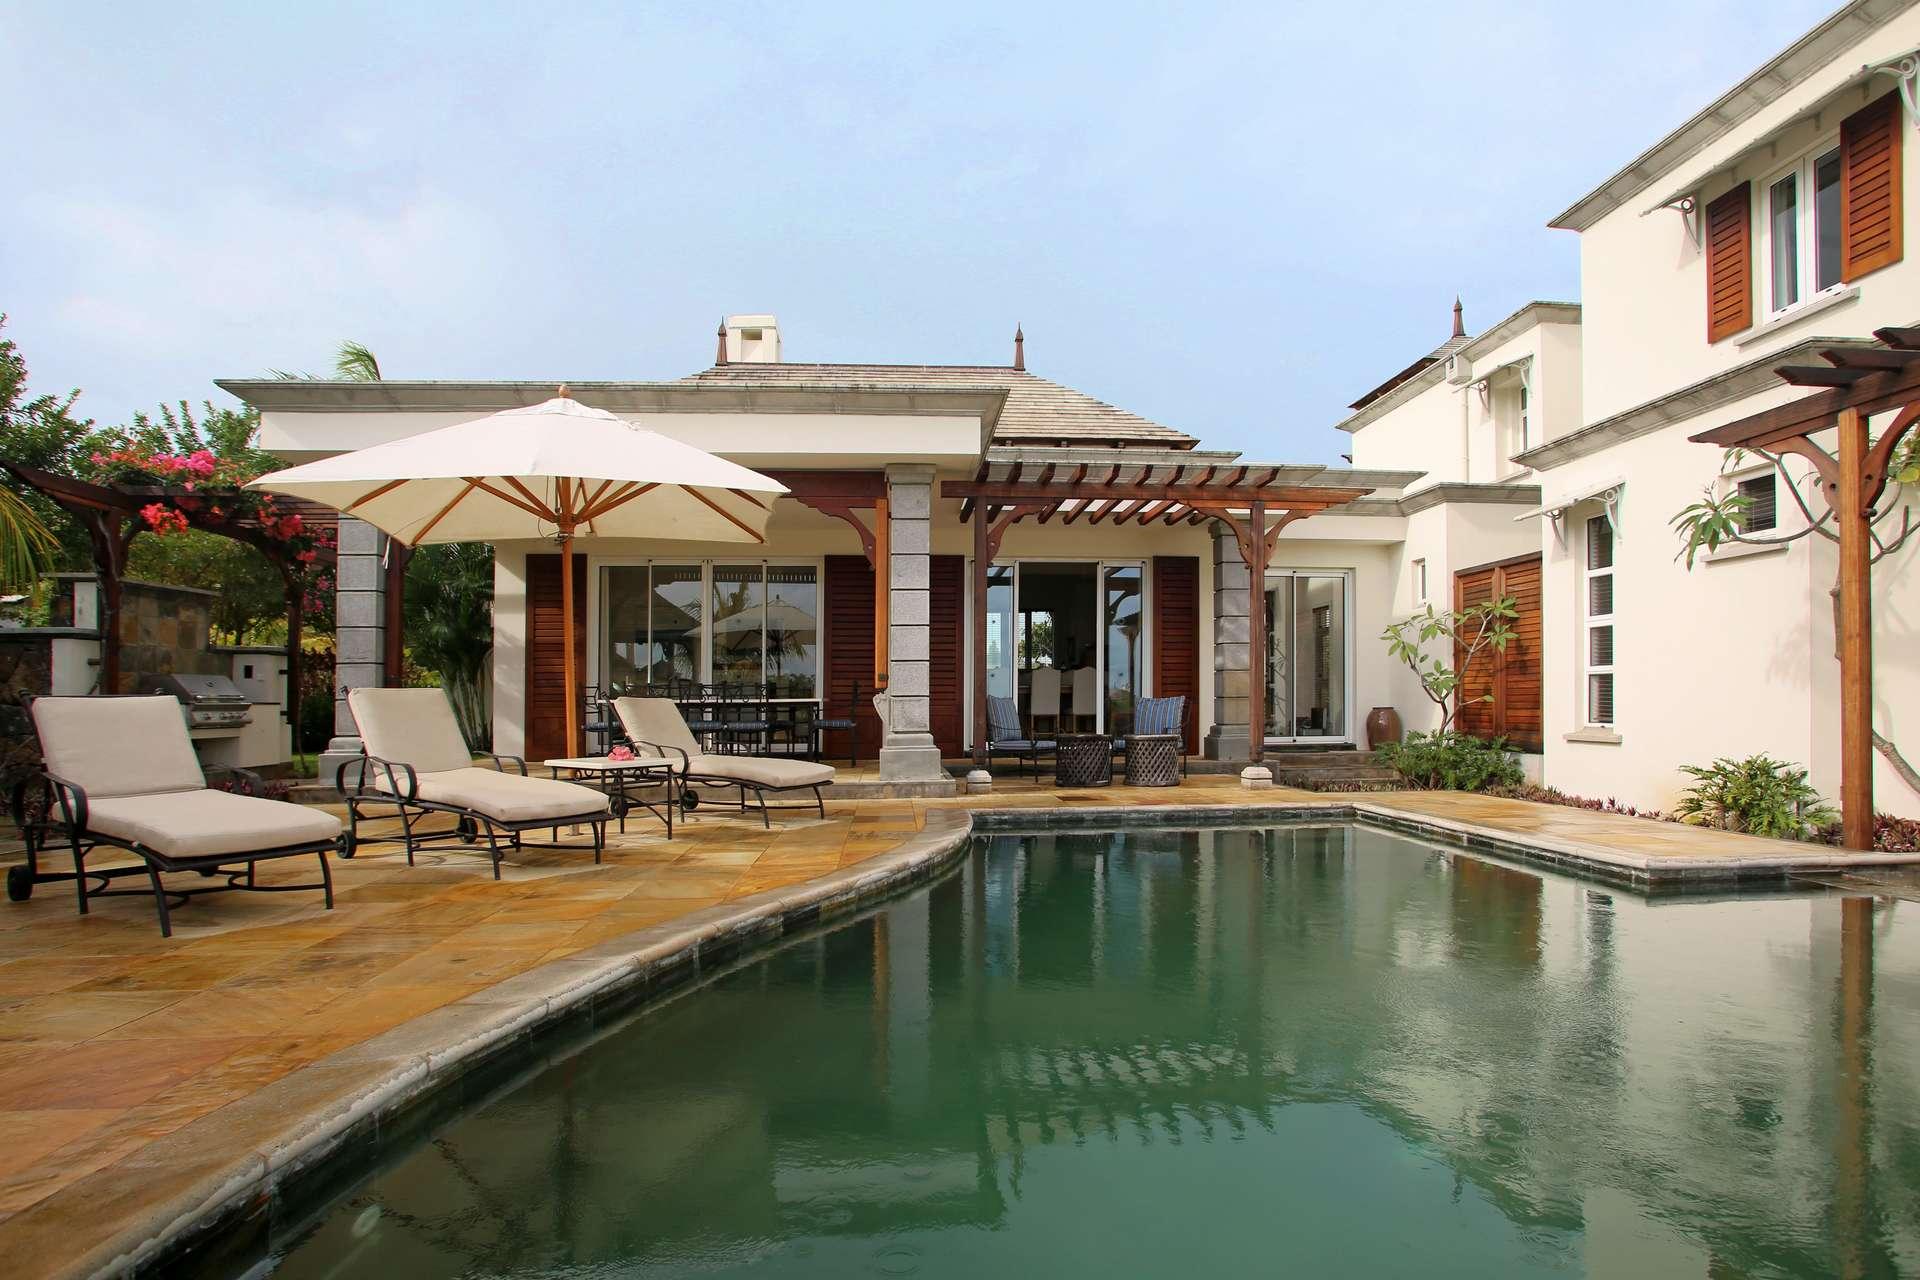 Luxury villa rentals africa - Mauritius - Bel ombre - No location 4 - Bel Ombre 92 - Image 1/17